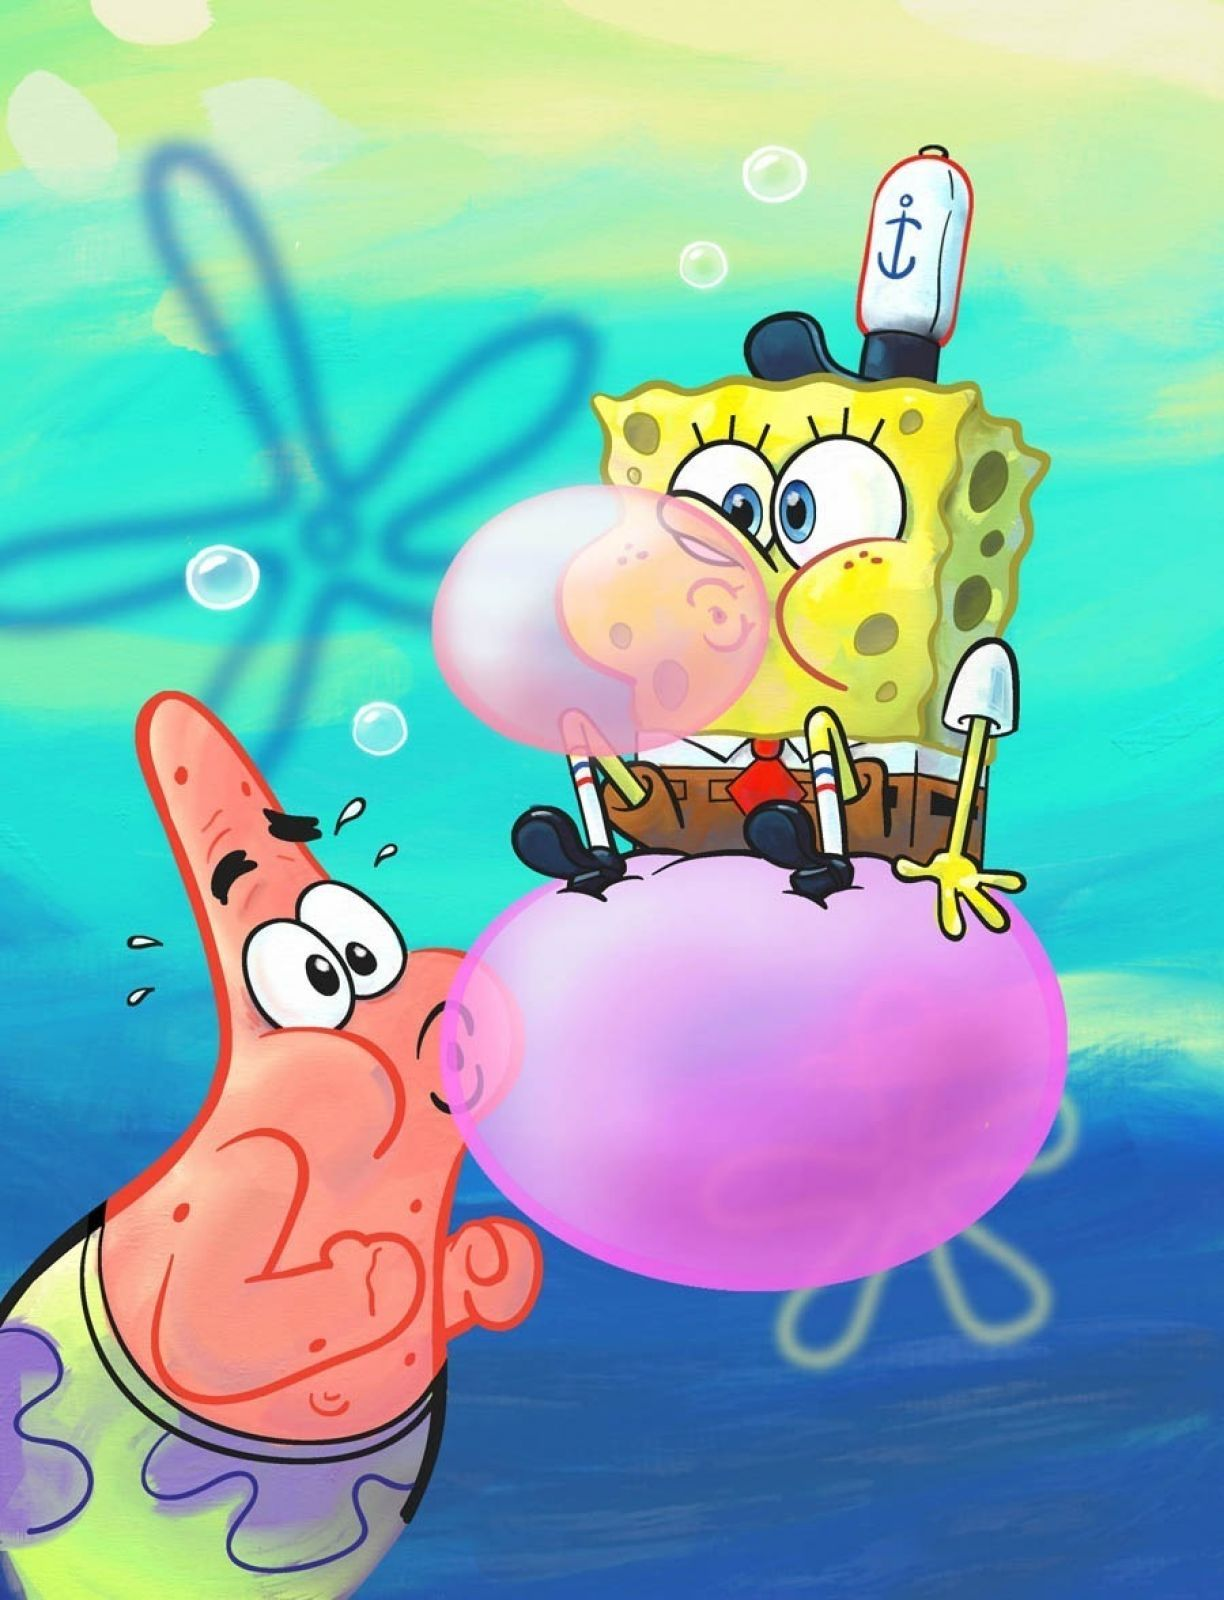 Spongebob Squarepants Patrick Spongebob Spongebob